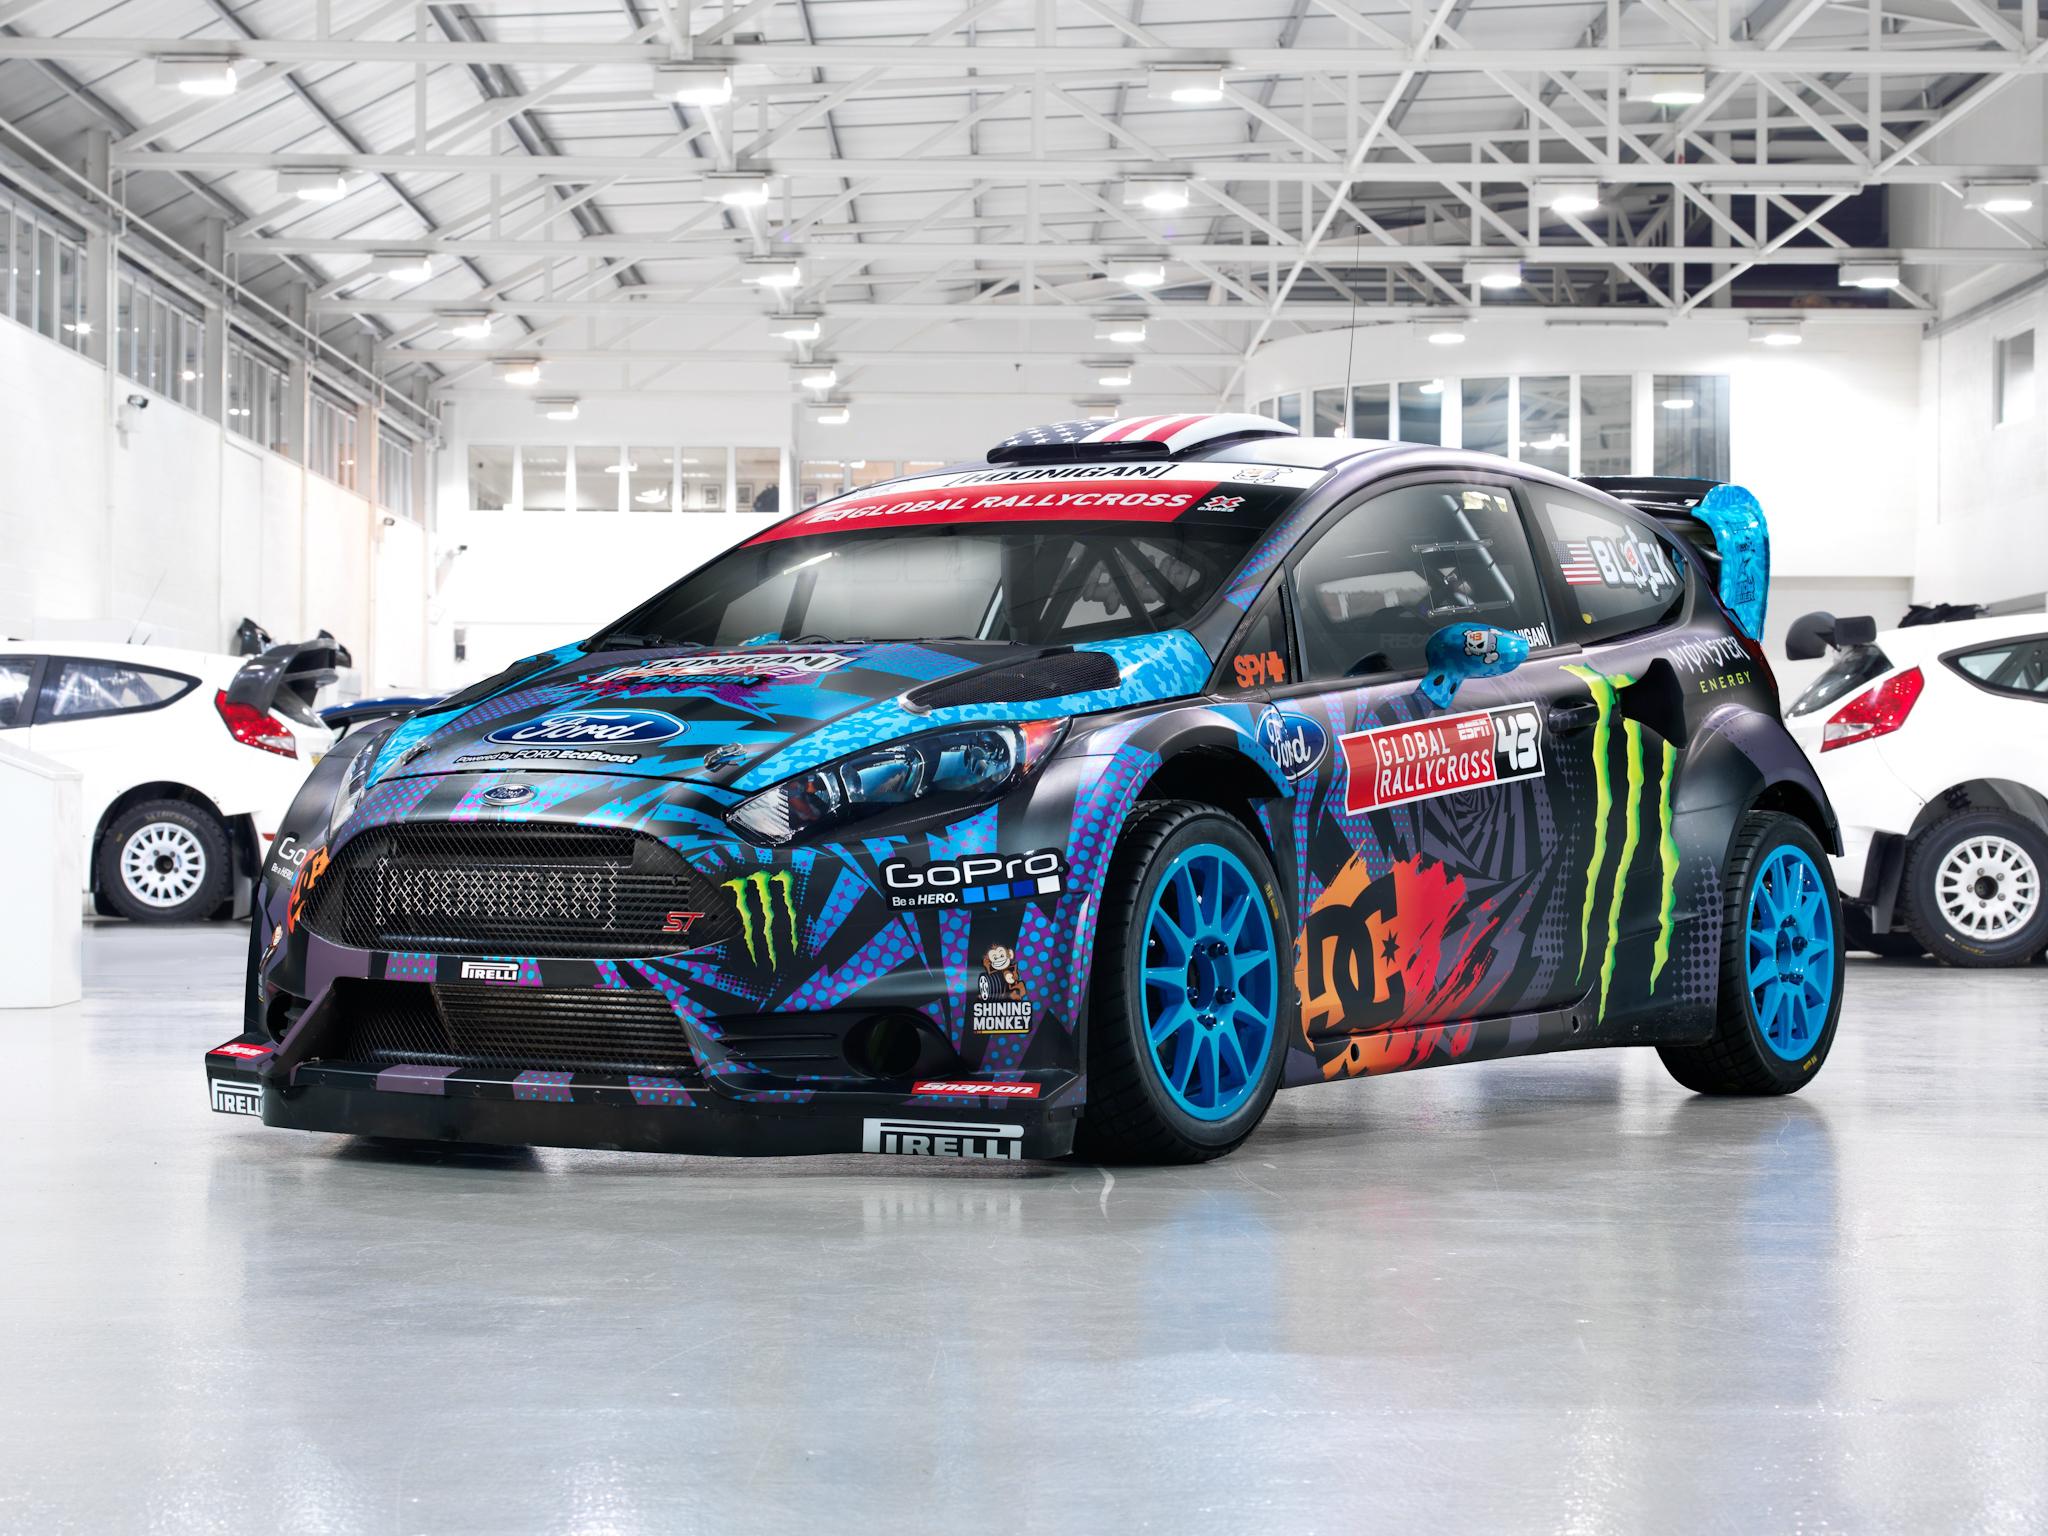 Fiesta S T RX43 Rallycross race racing tuning wallpaper background 2048x1536